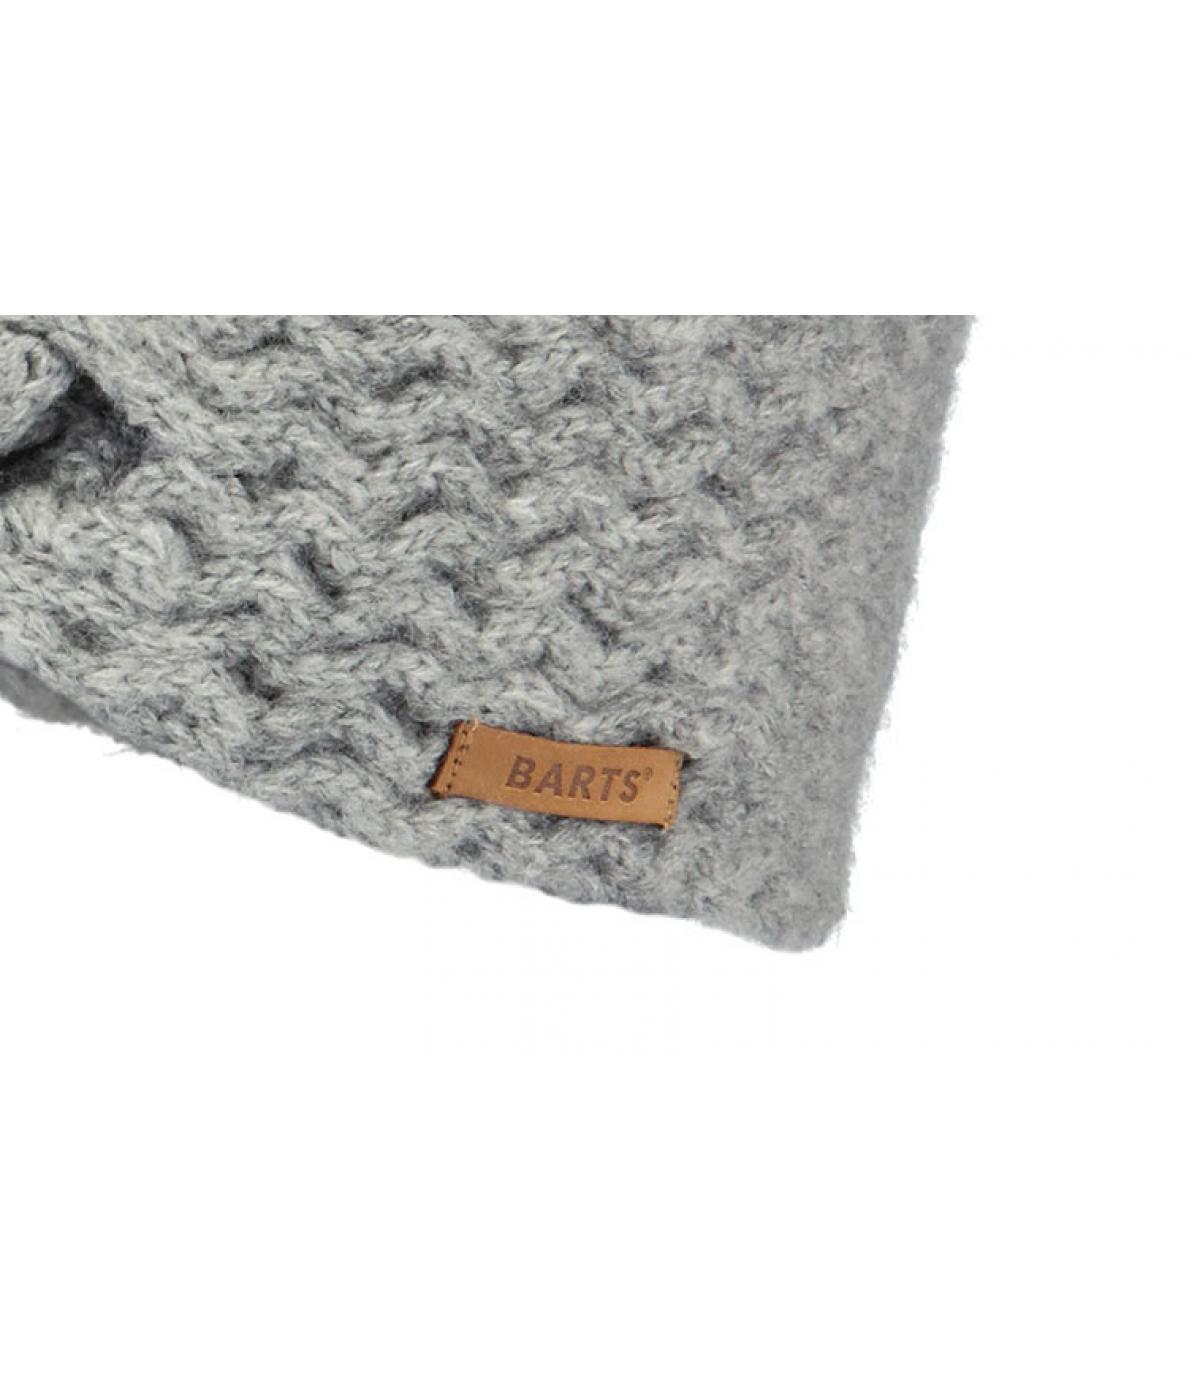 Details Kids Rozamond Headband heather grey - Abbildung 3